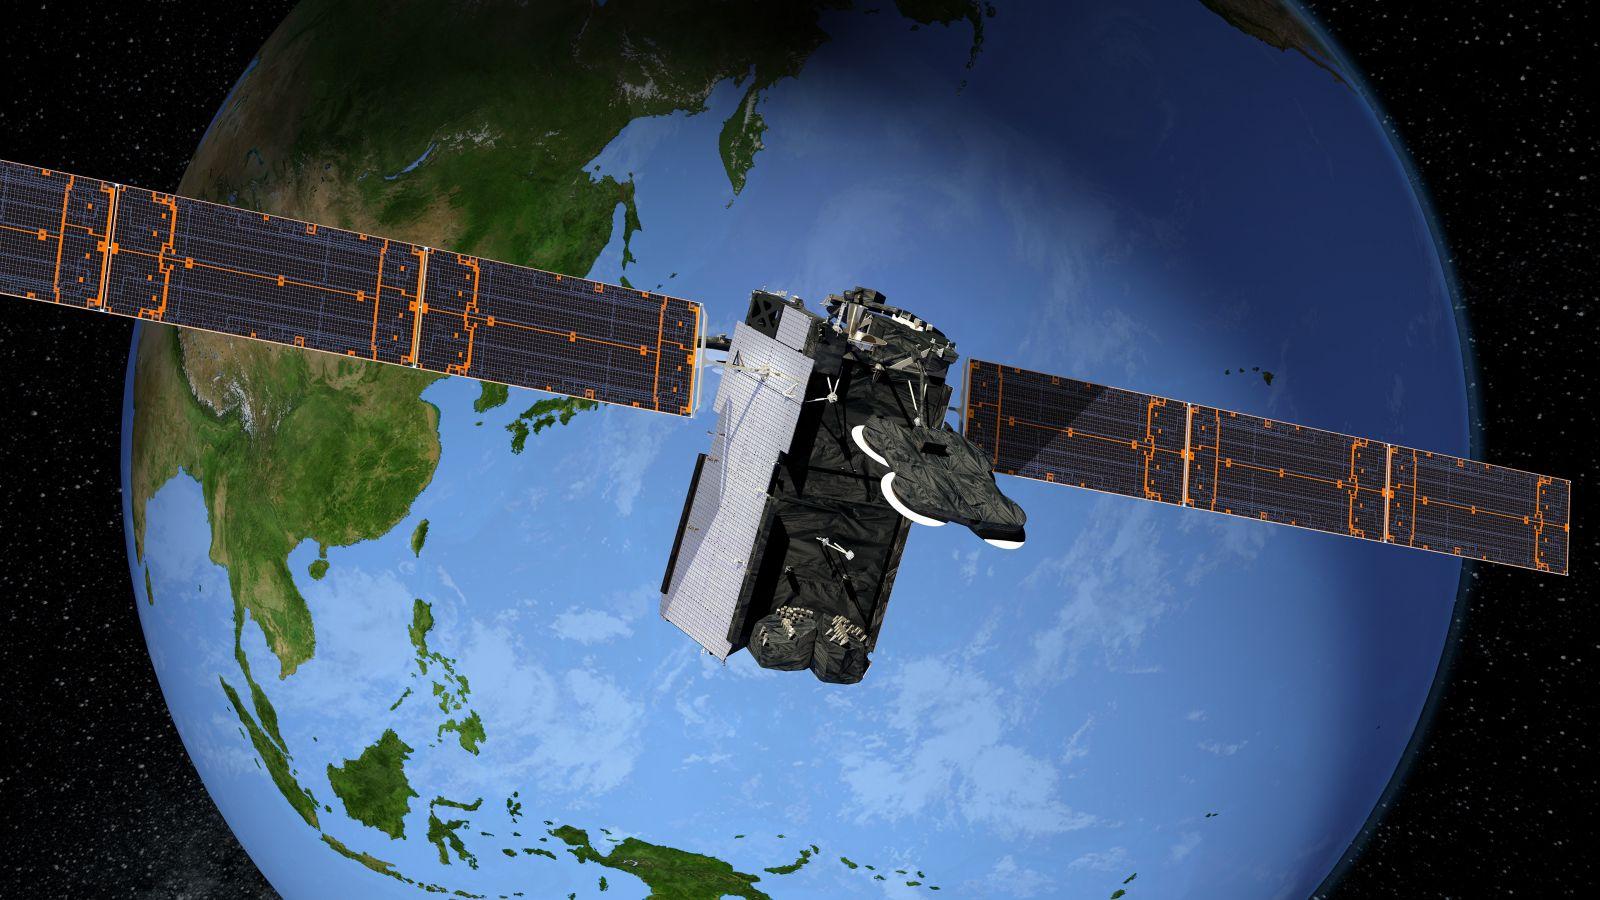 Boeing 702 satellite